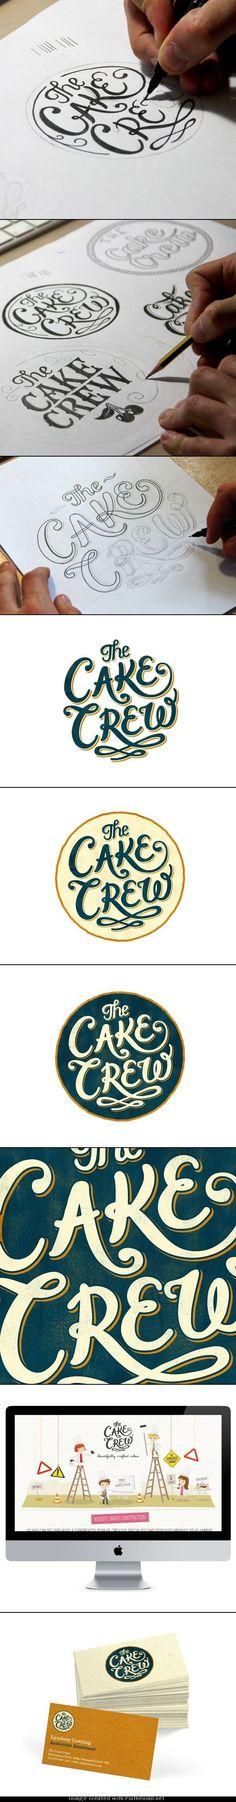 The Cake Crew - Tobias Hall